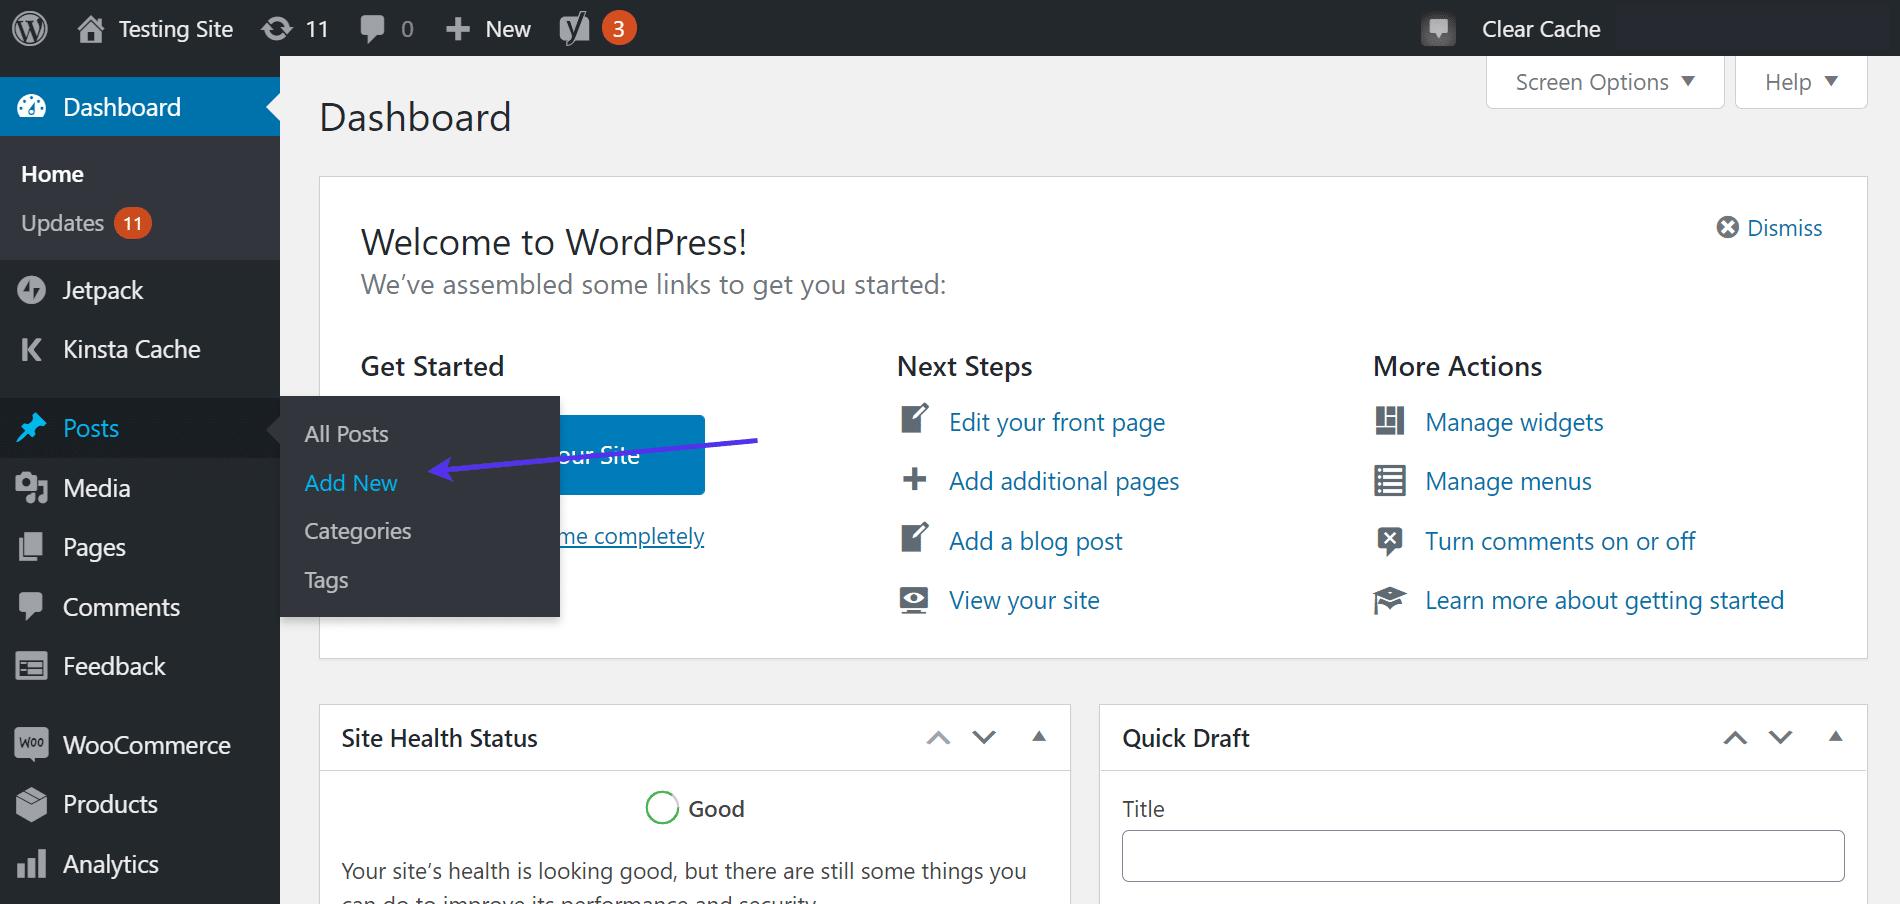 Posts > Add New link in WordPress dashboard